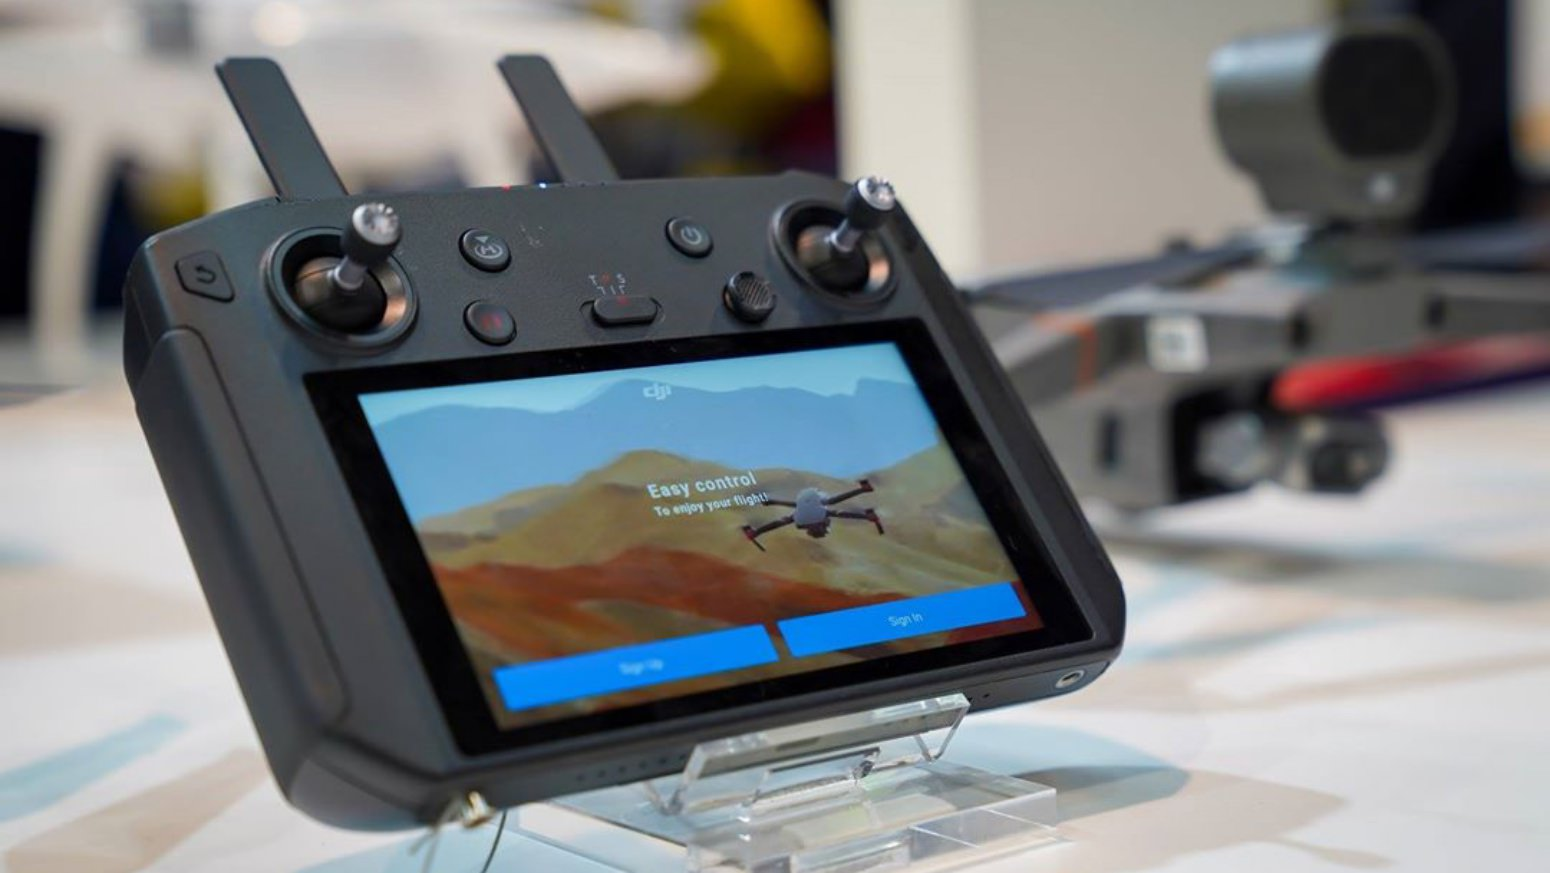 DJI Smart Controller new firmware released - v01 00 1400 - DroneDJ